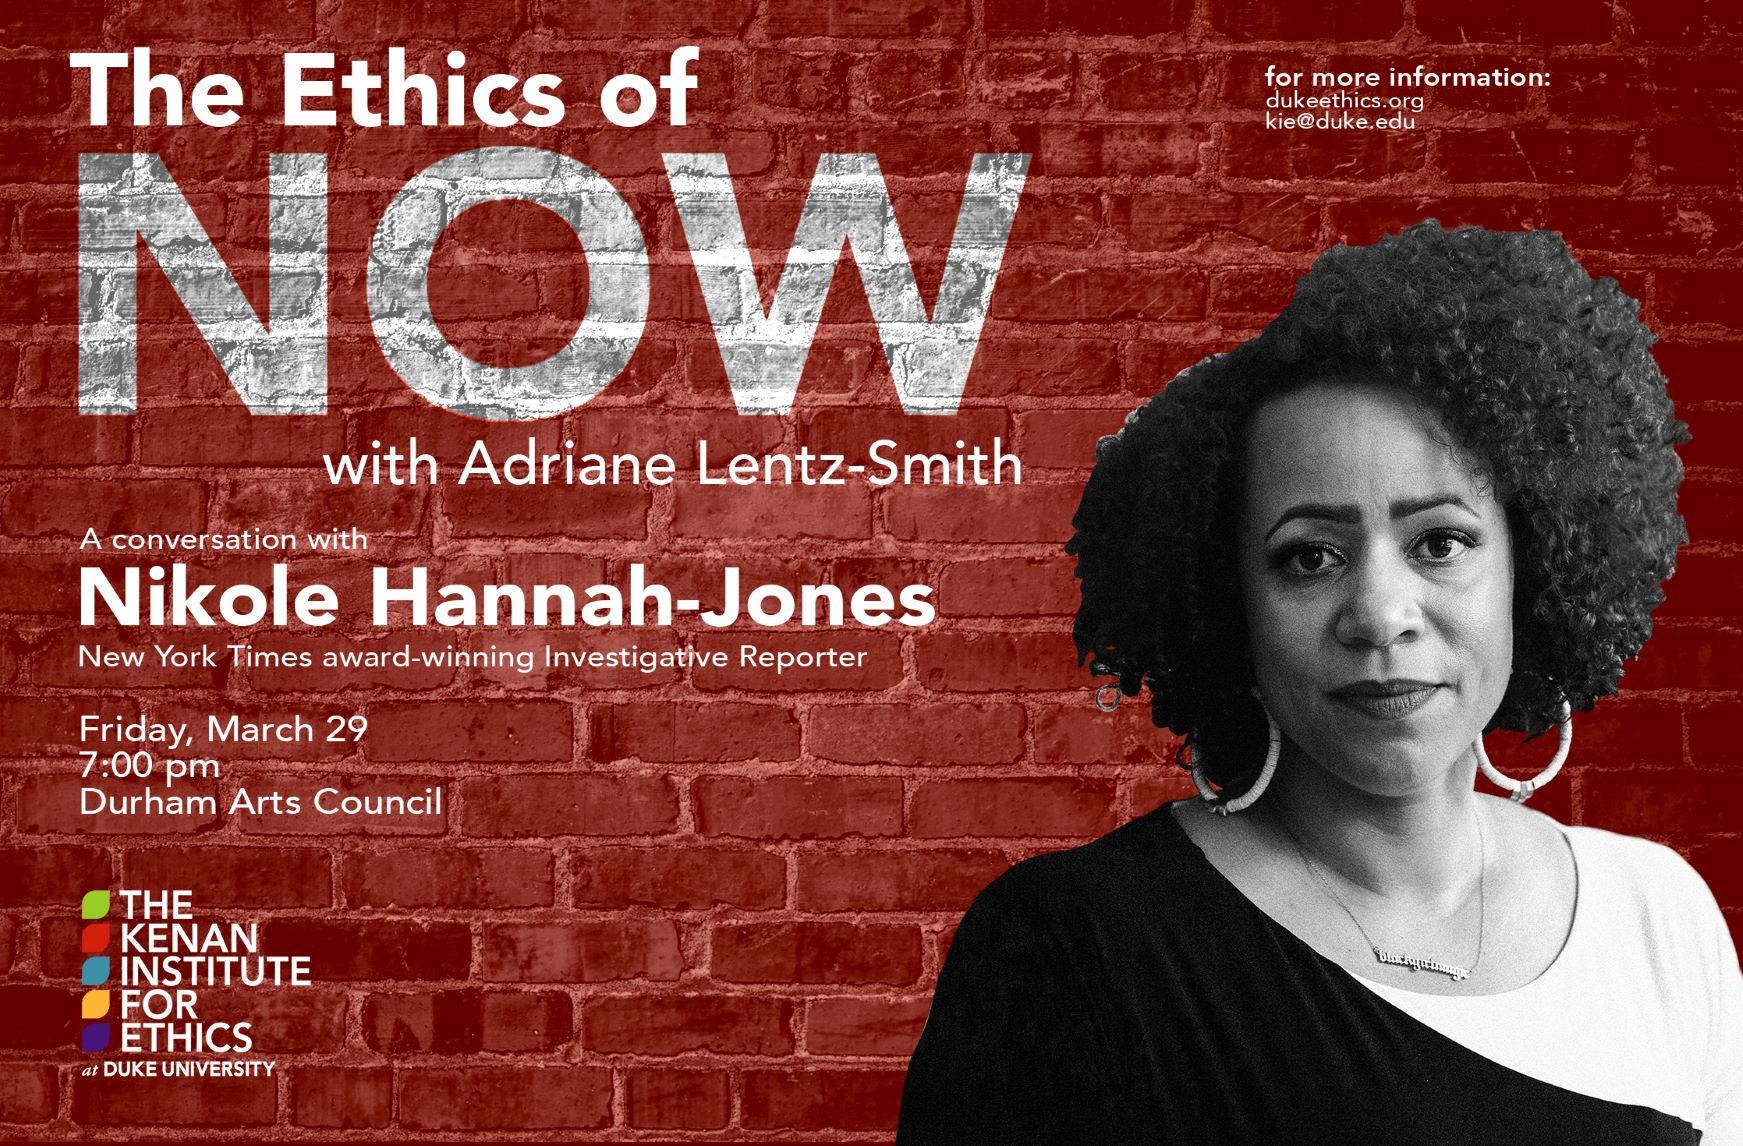 ethics of now Nikole Hannah-Jones